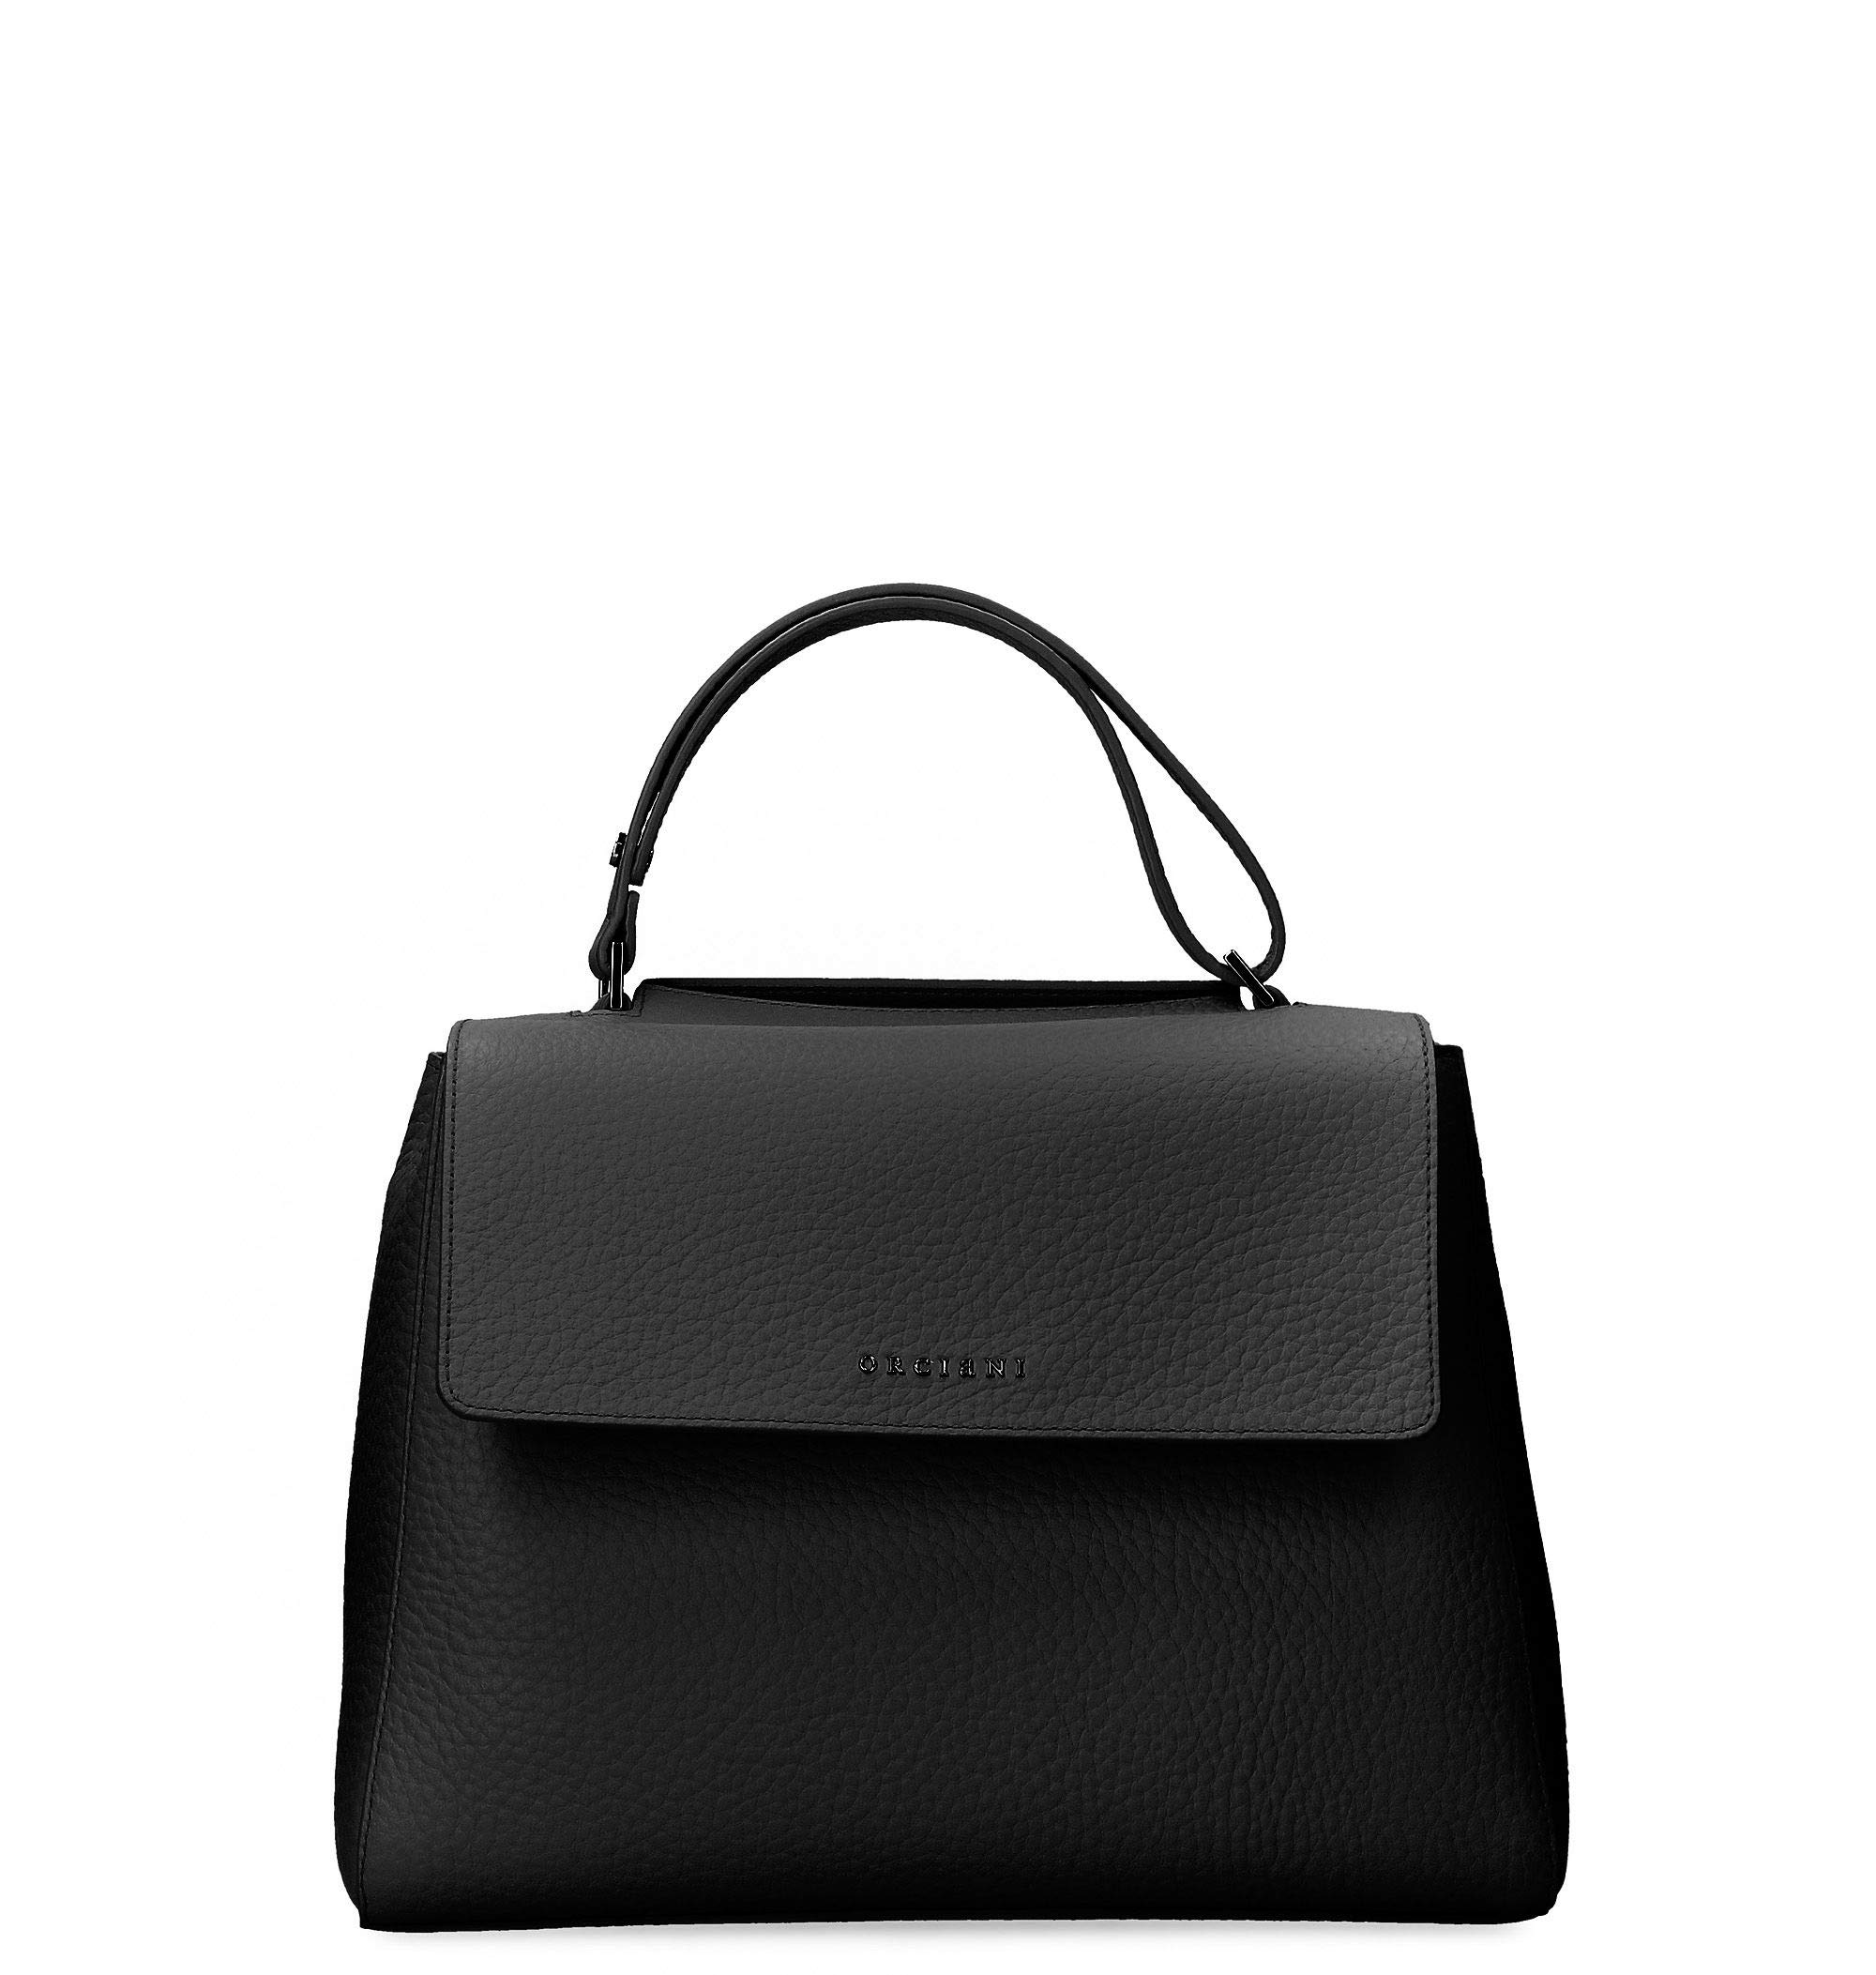 Orciani Women's B02006softnero Black Leather Tote